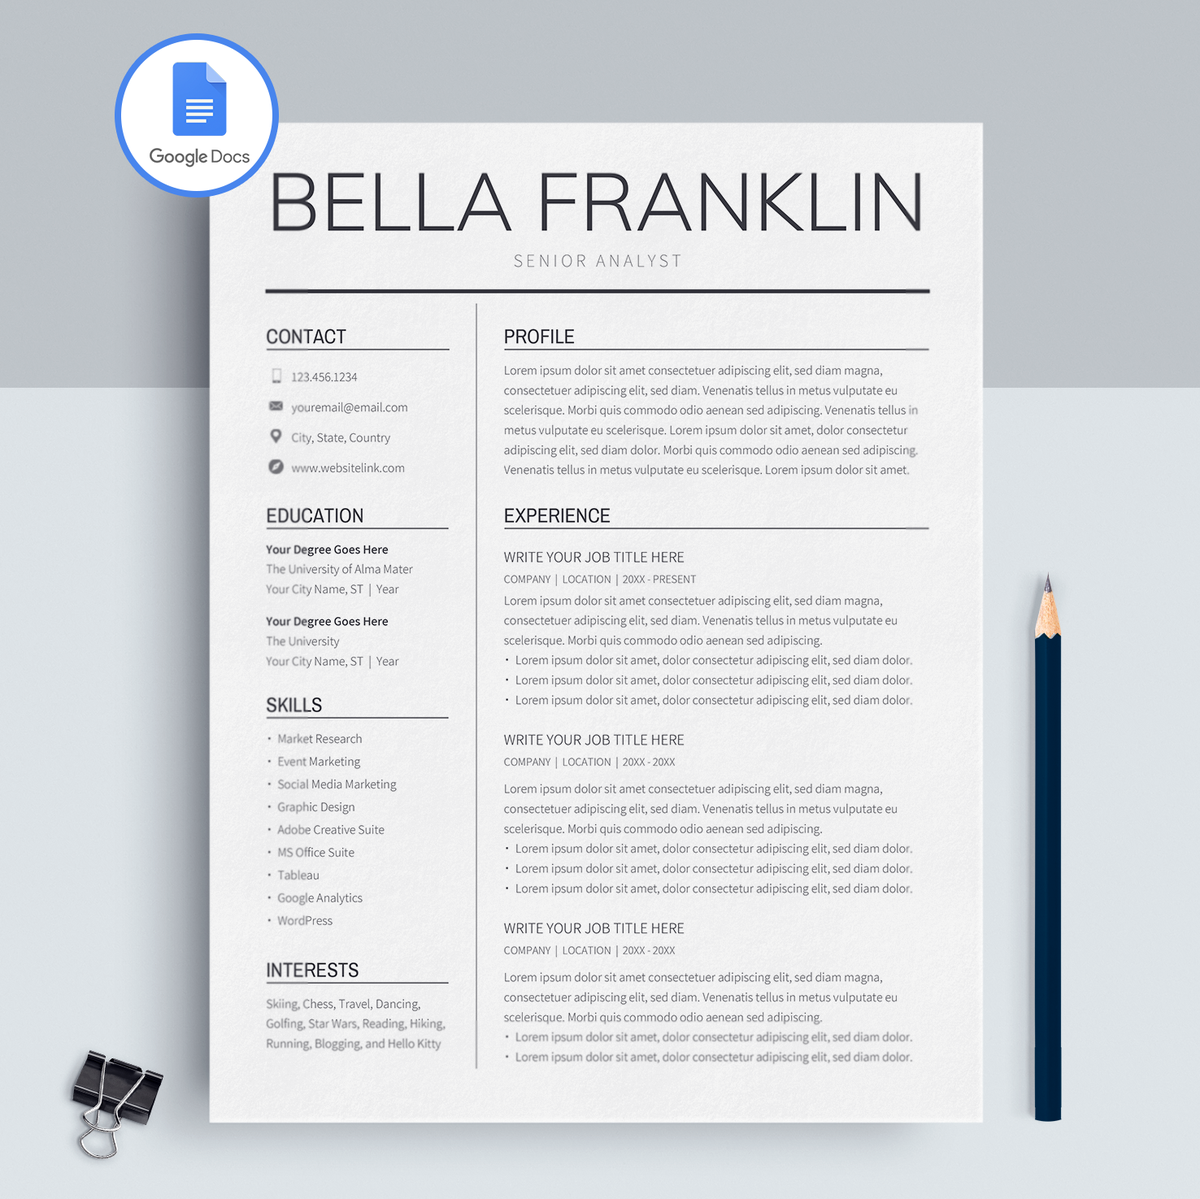 Bella Franklin Google Docs Resume Template Cv Template Cv Template Resume Template Resume Tips